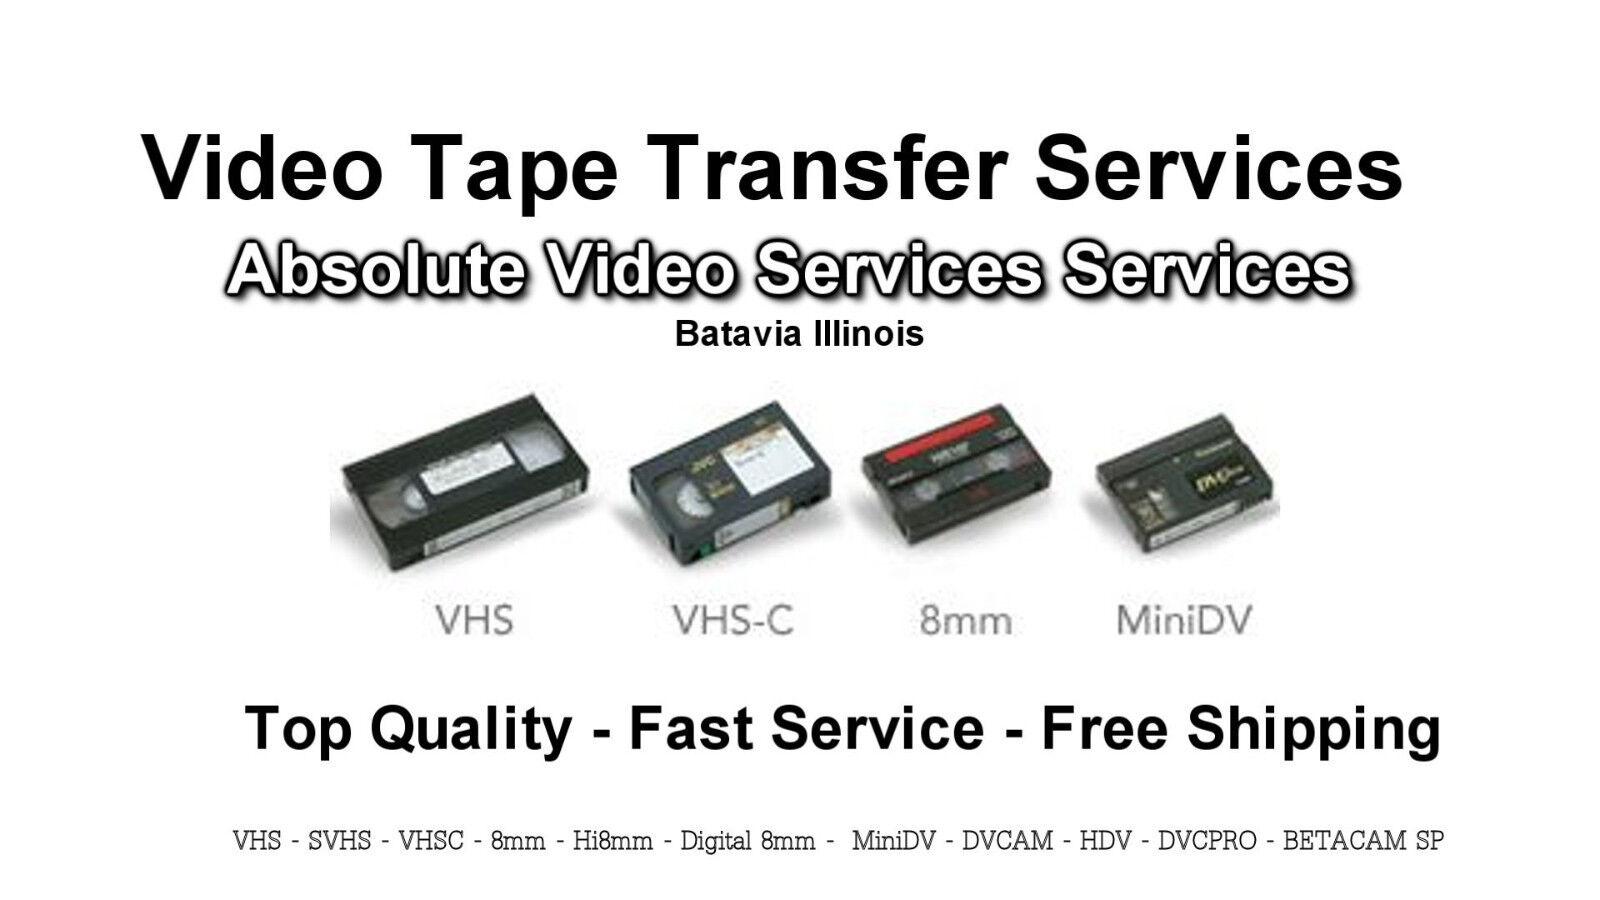 Video Tape Transfer Service to DVD 8MM HI8MM Digital 8MM Video Tape Convert